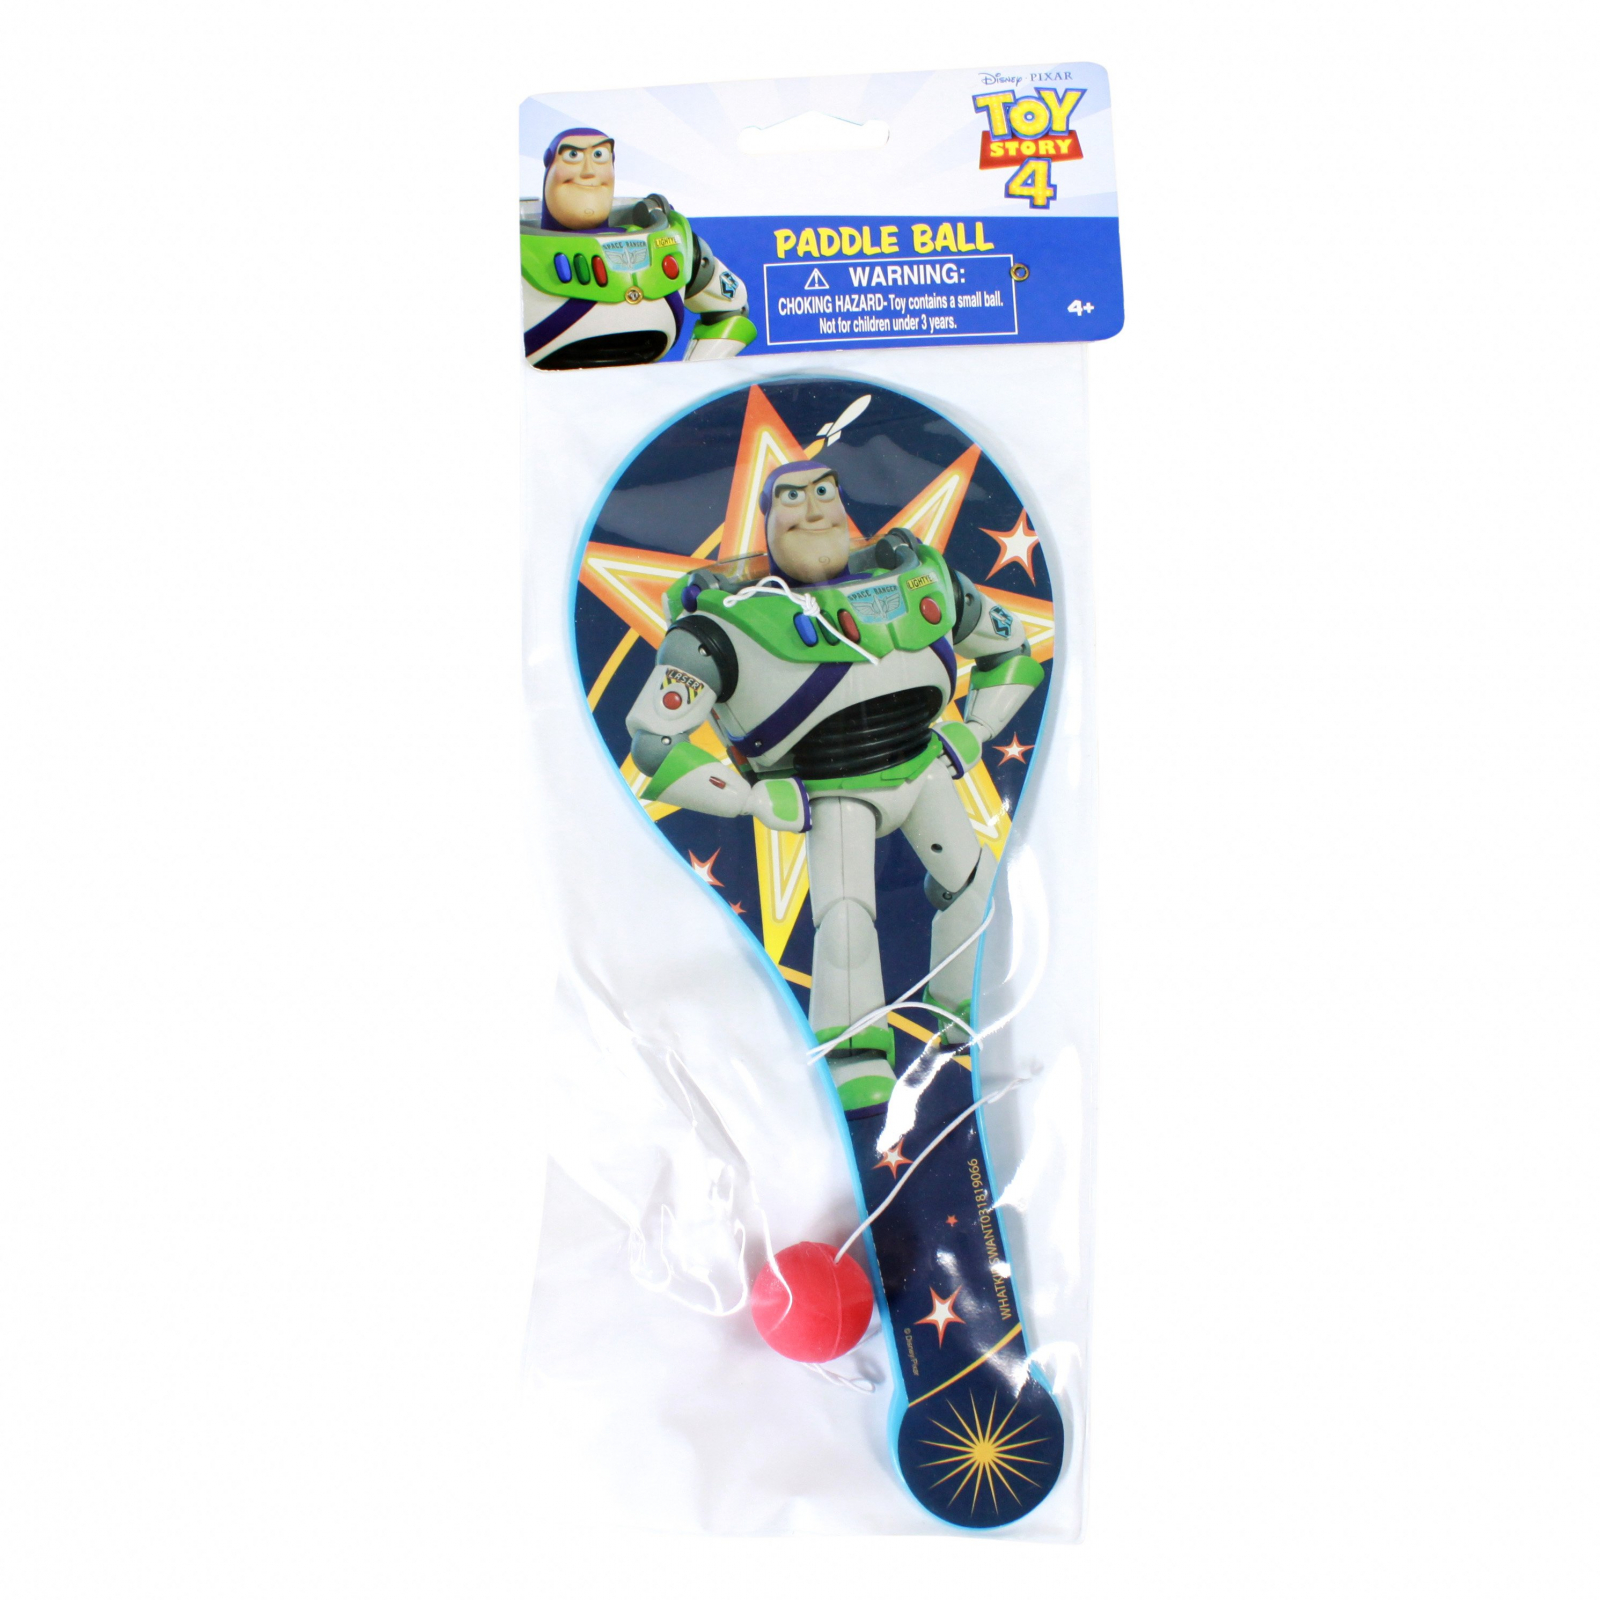 Disney Pixar Toy Story 4 Buzz Lightyear Paddle Ball